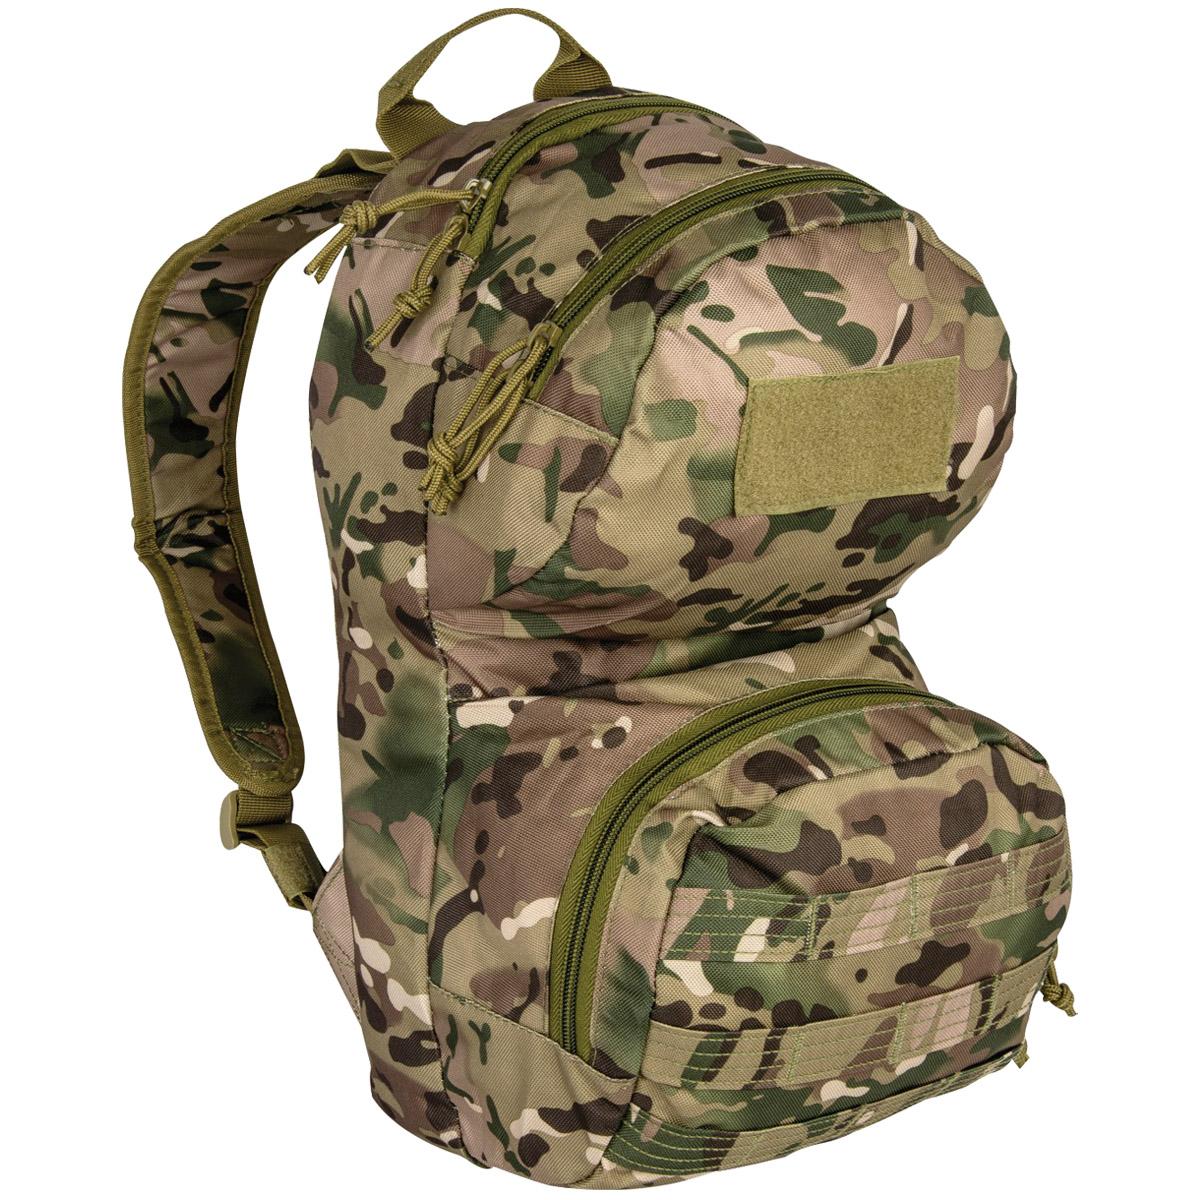 Highlander 12L Scout Pack HMTC